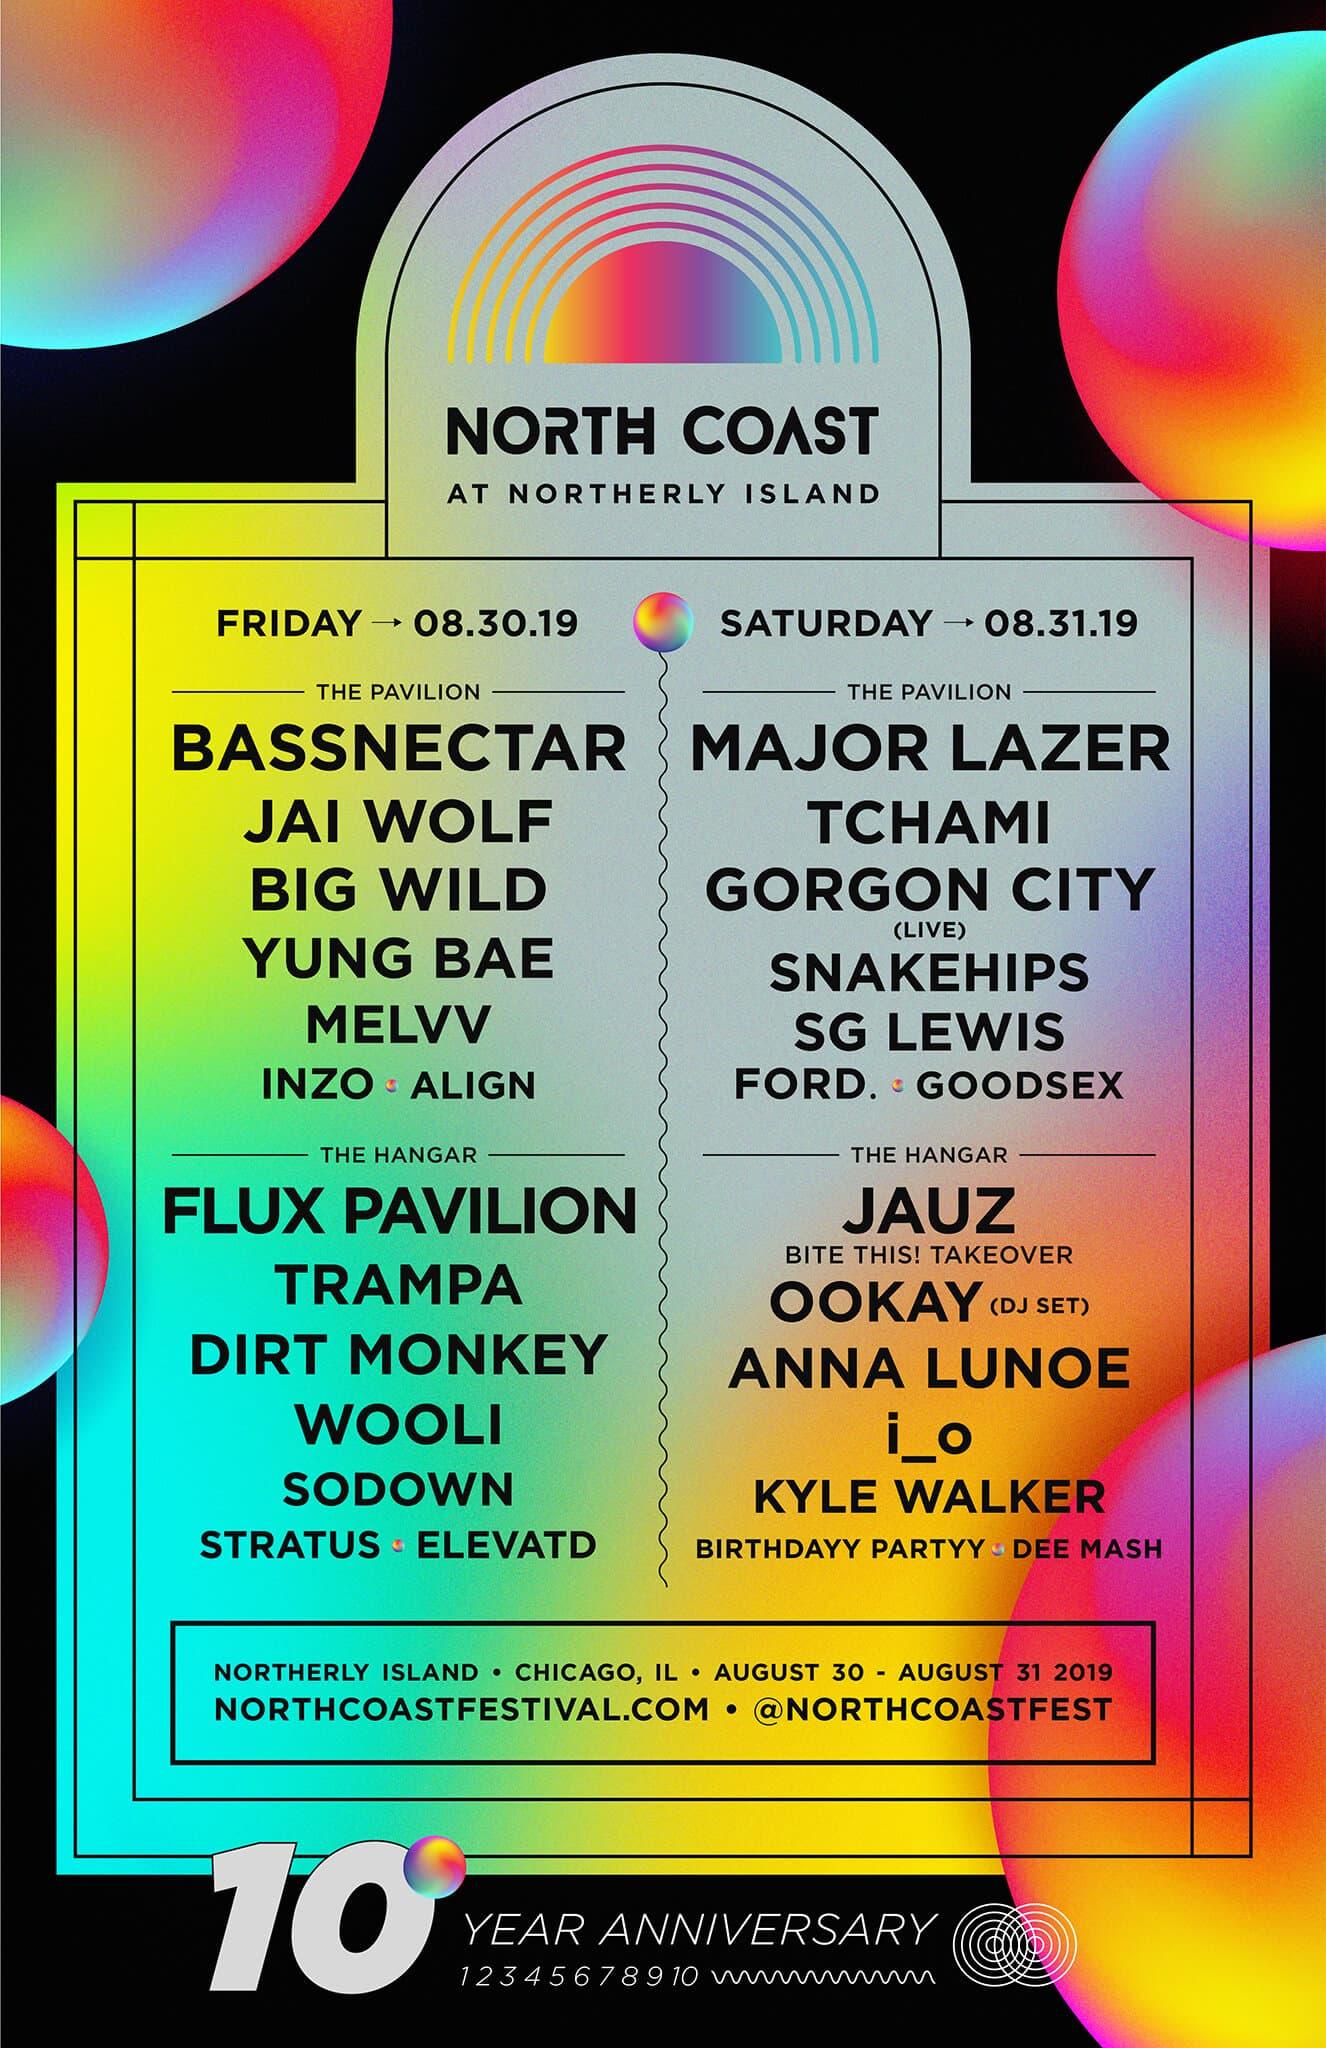 north coast music festival 2019 lineup - North Coast Music Festival 2019 Lineup